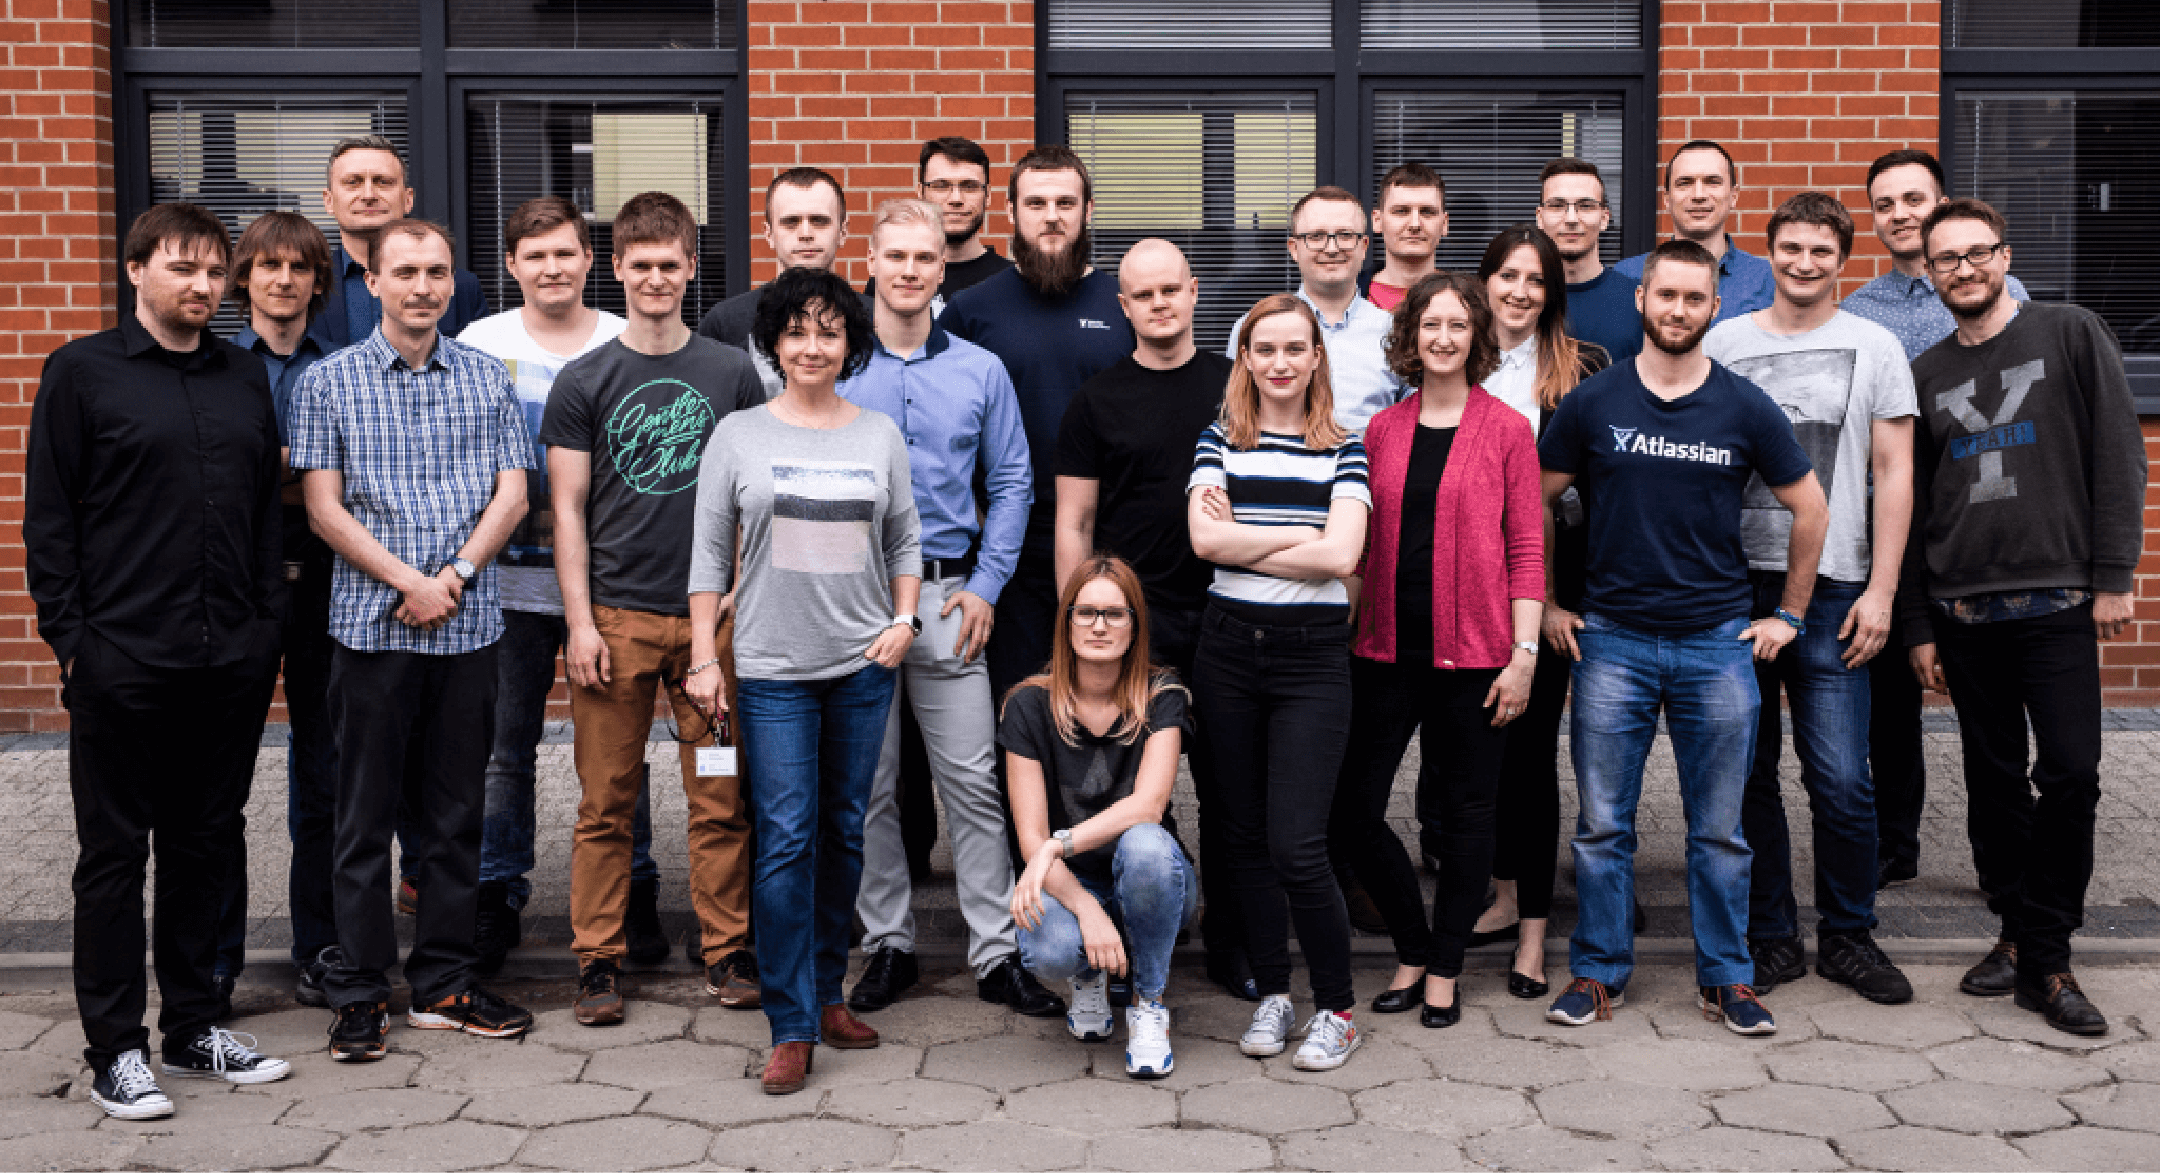 Zespół TTPSC Atlassian